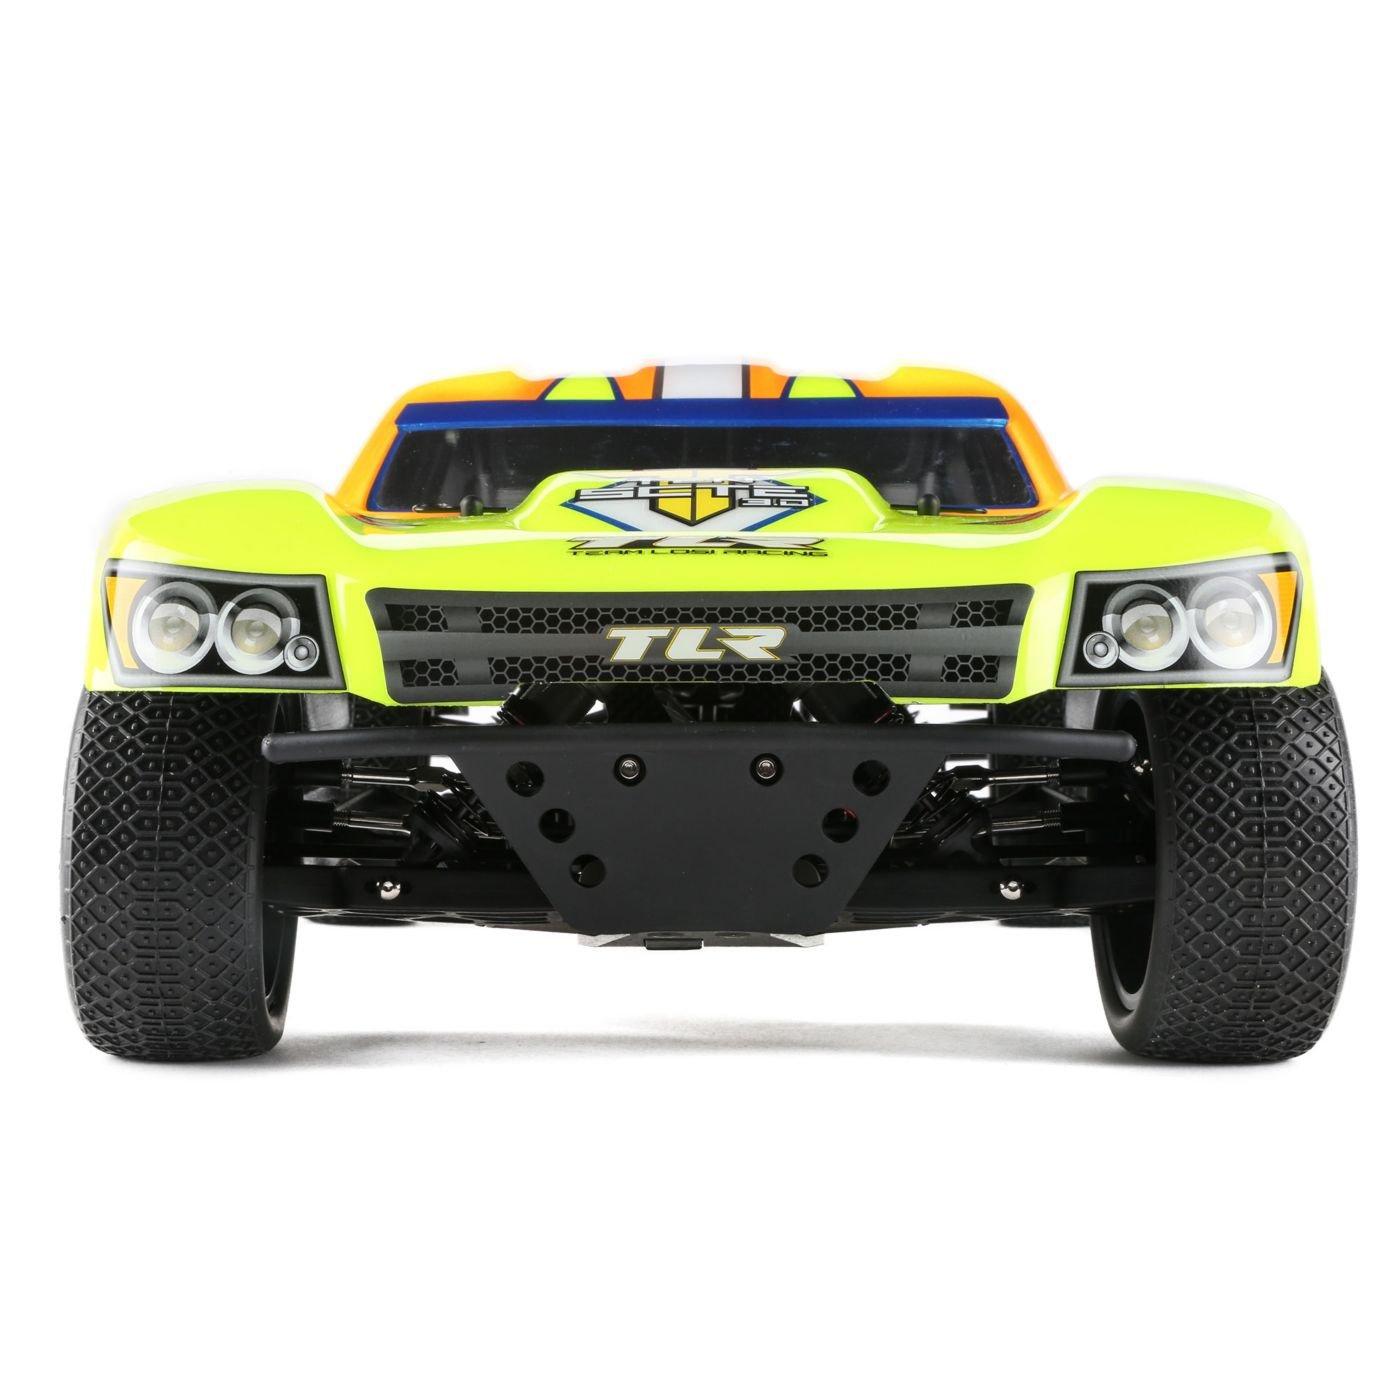 Team Losi 1/10 Ten-SCTE 3.0 4WD SCT Race Kit TLR03008 Toys & Games ...